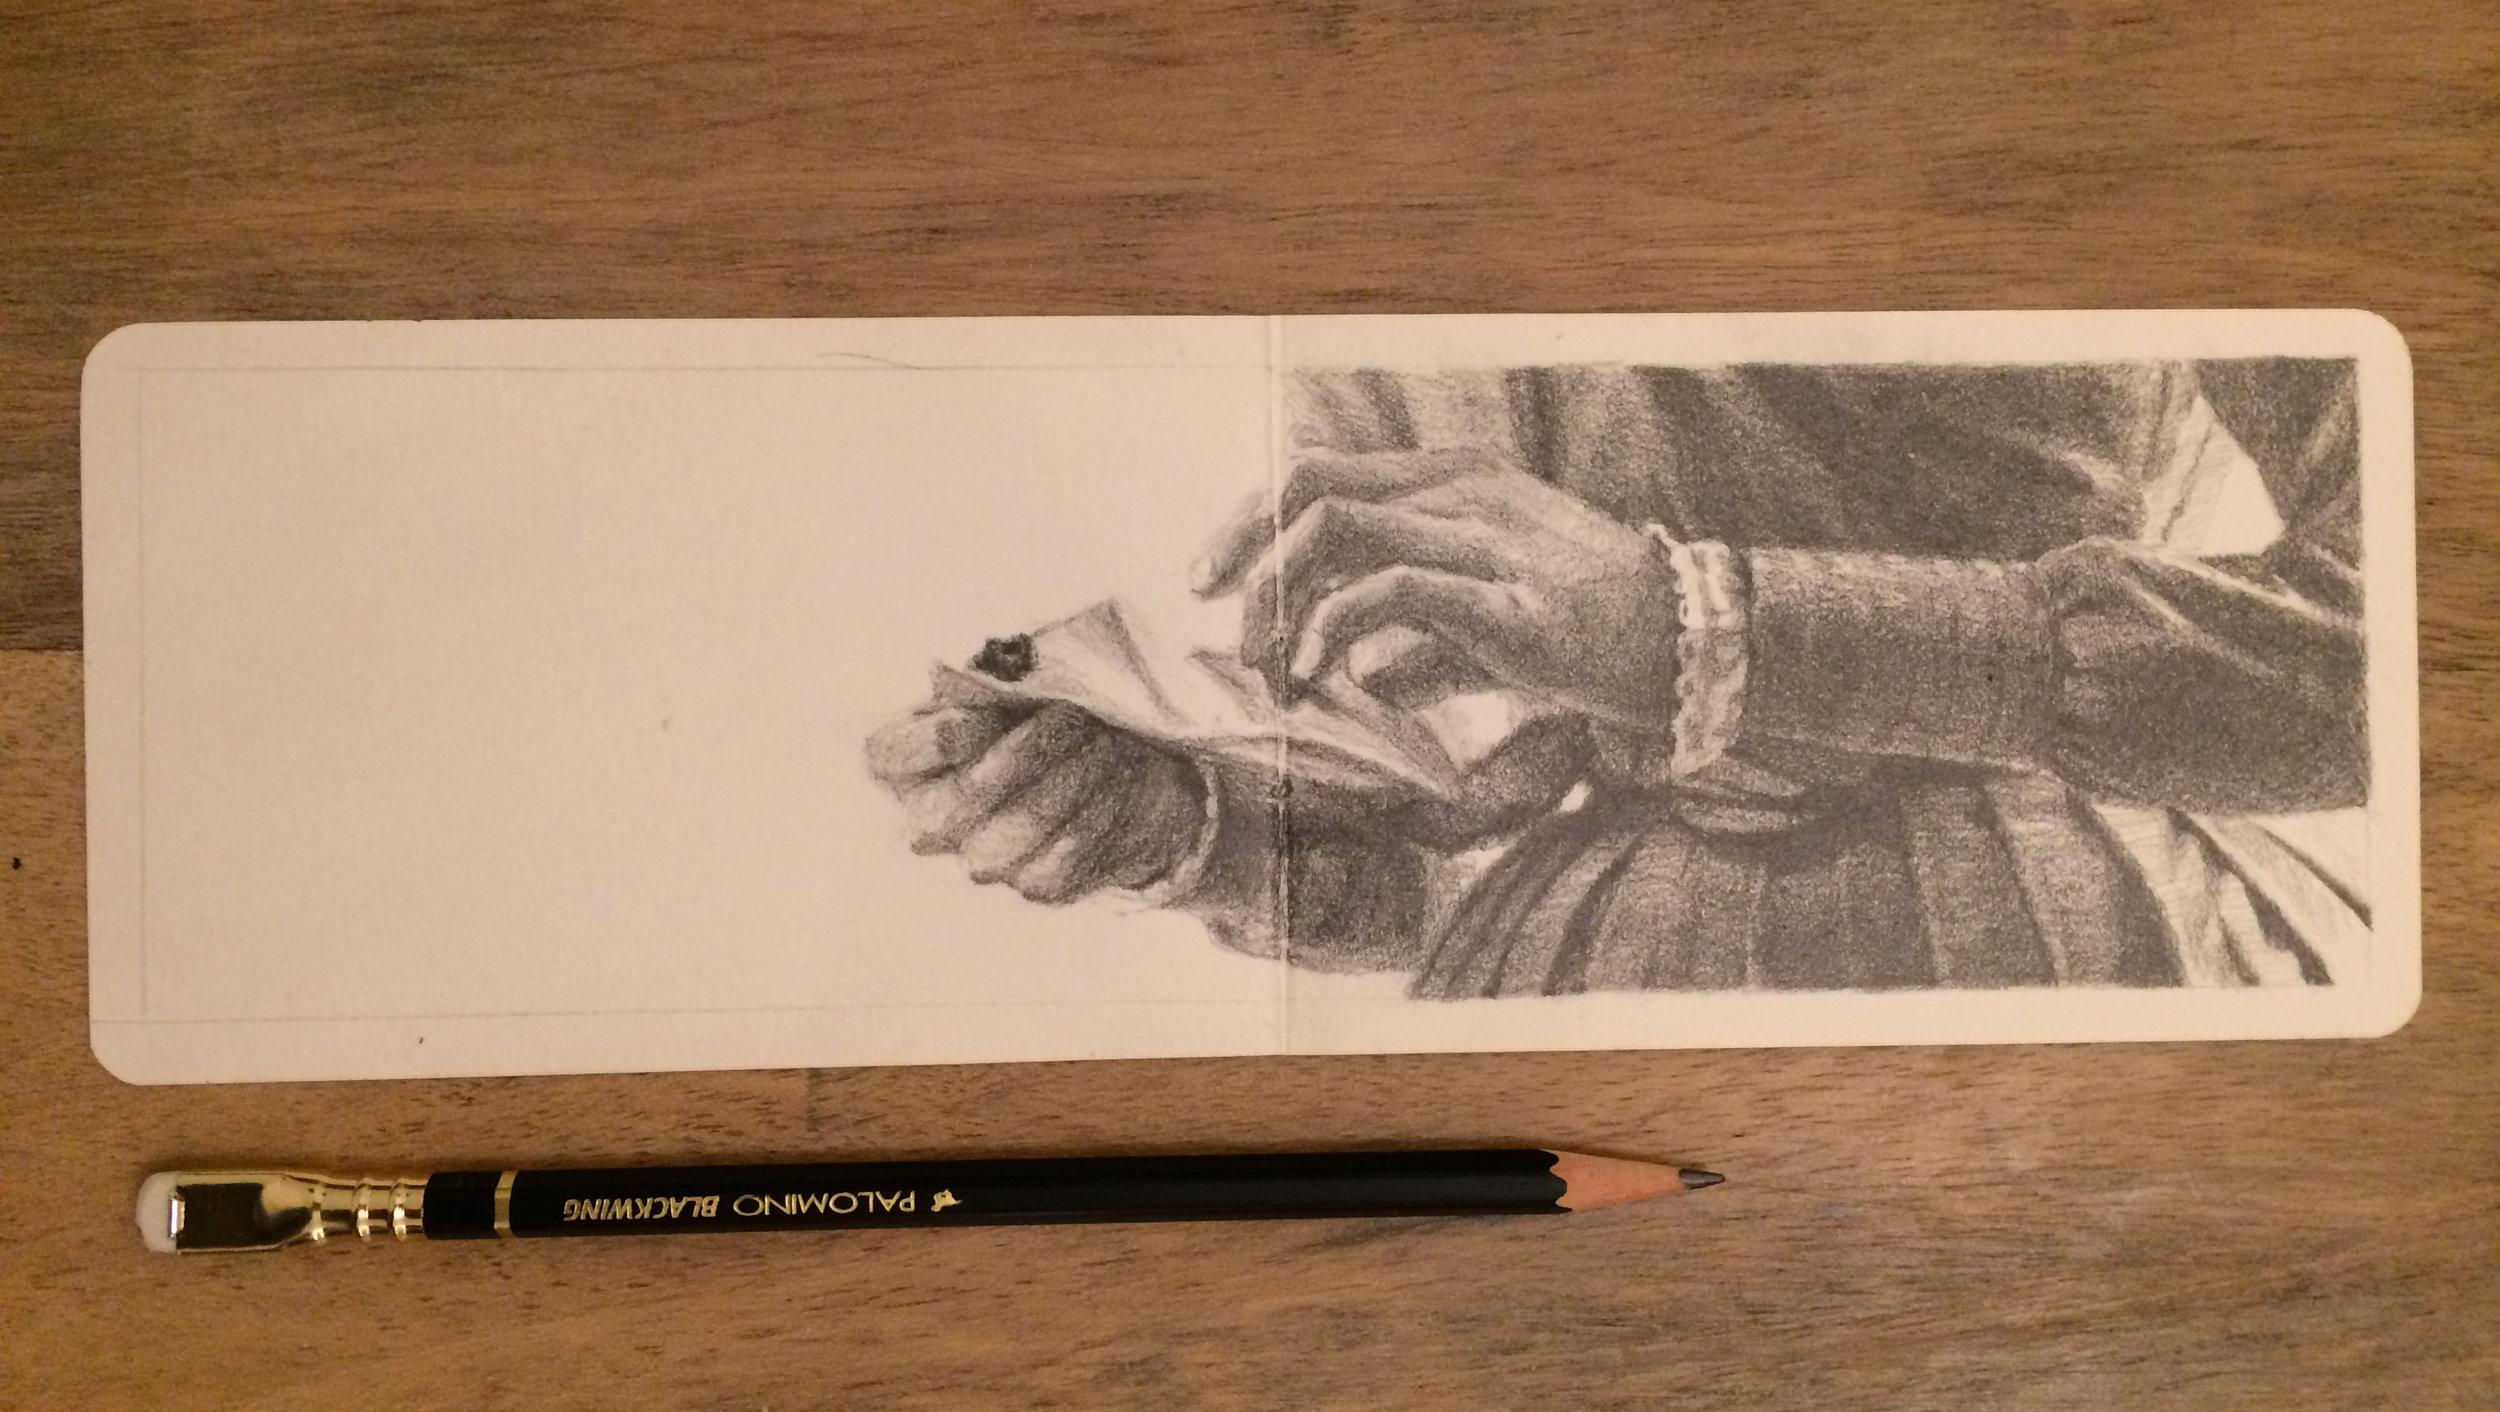 RAFAEL MARTIN C Sketchbook_002.jpg